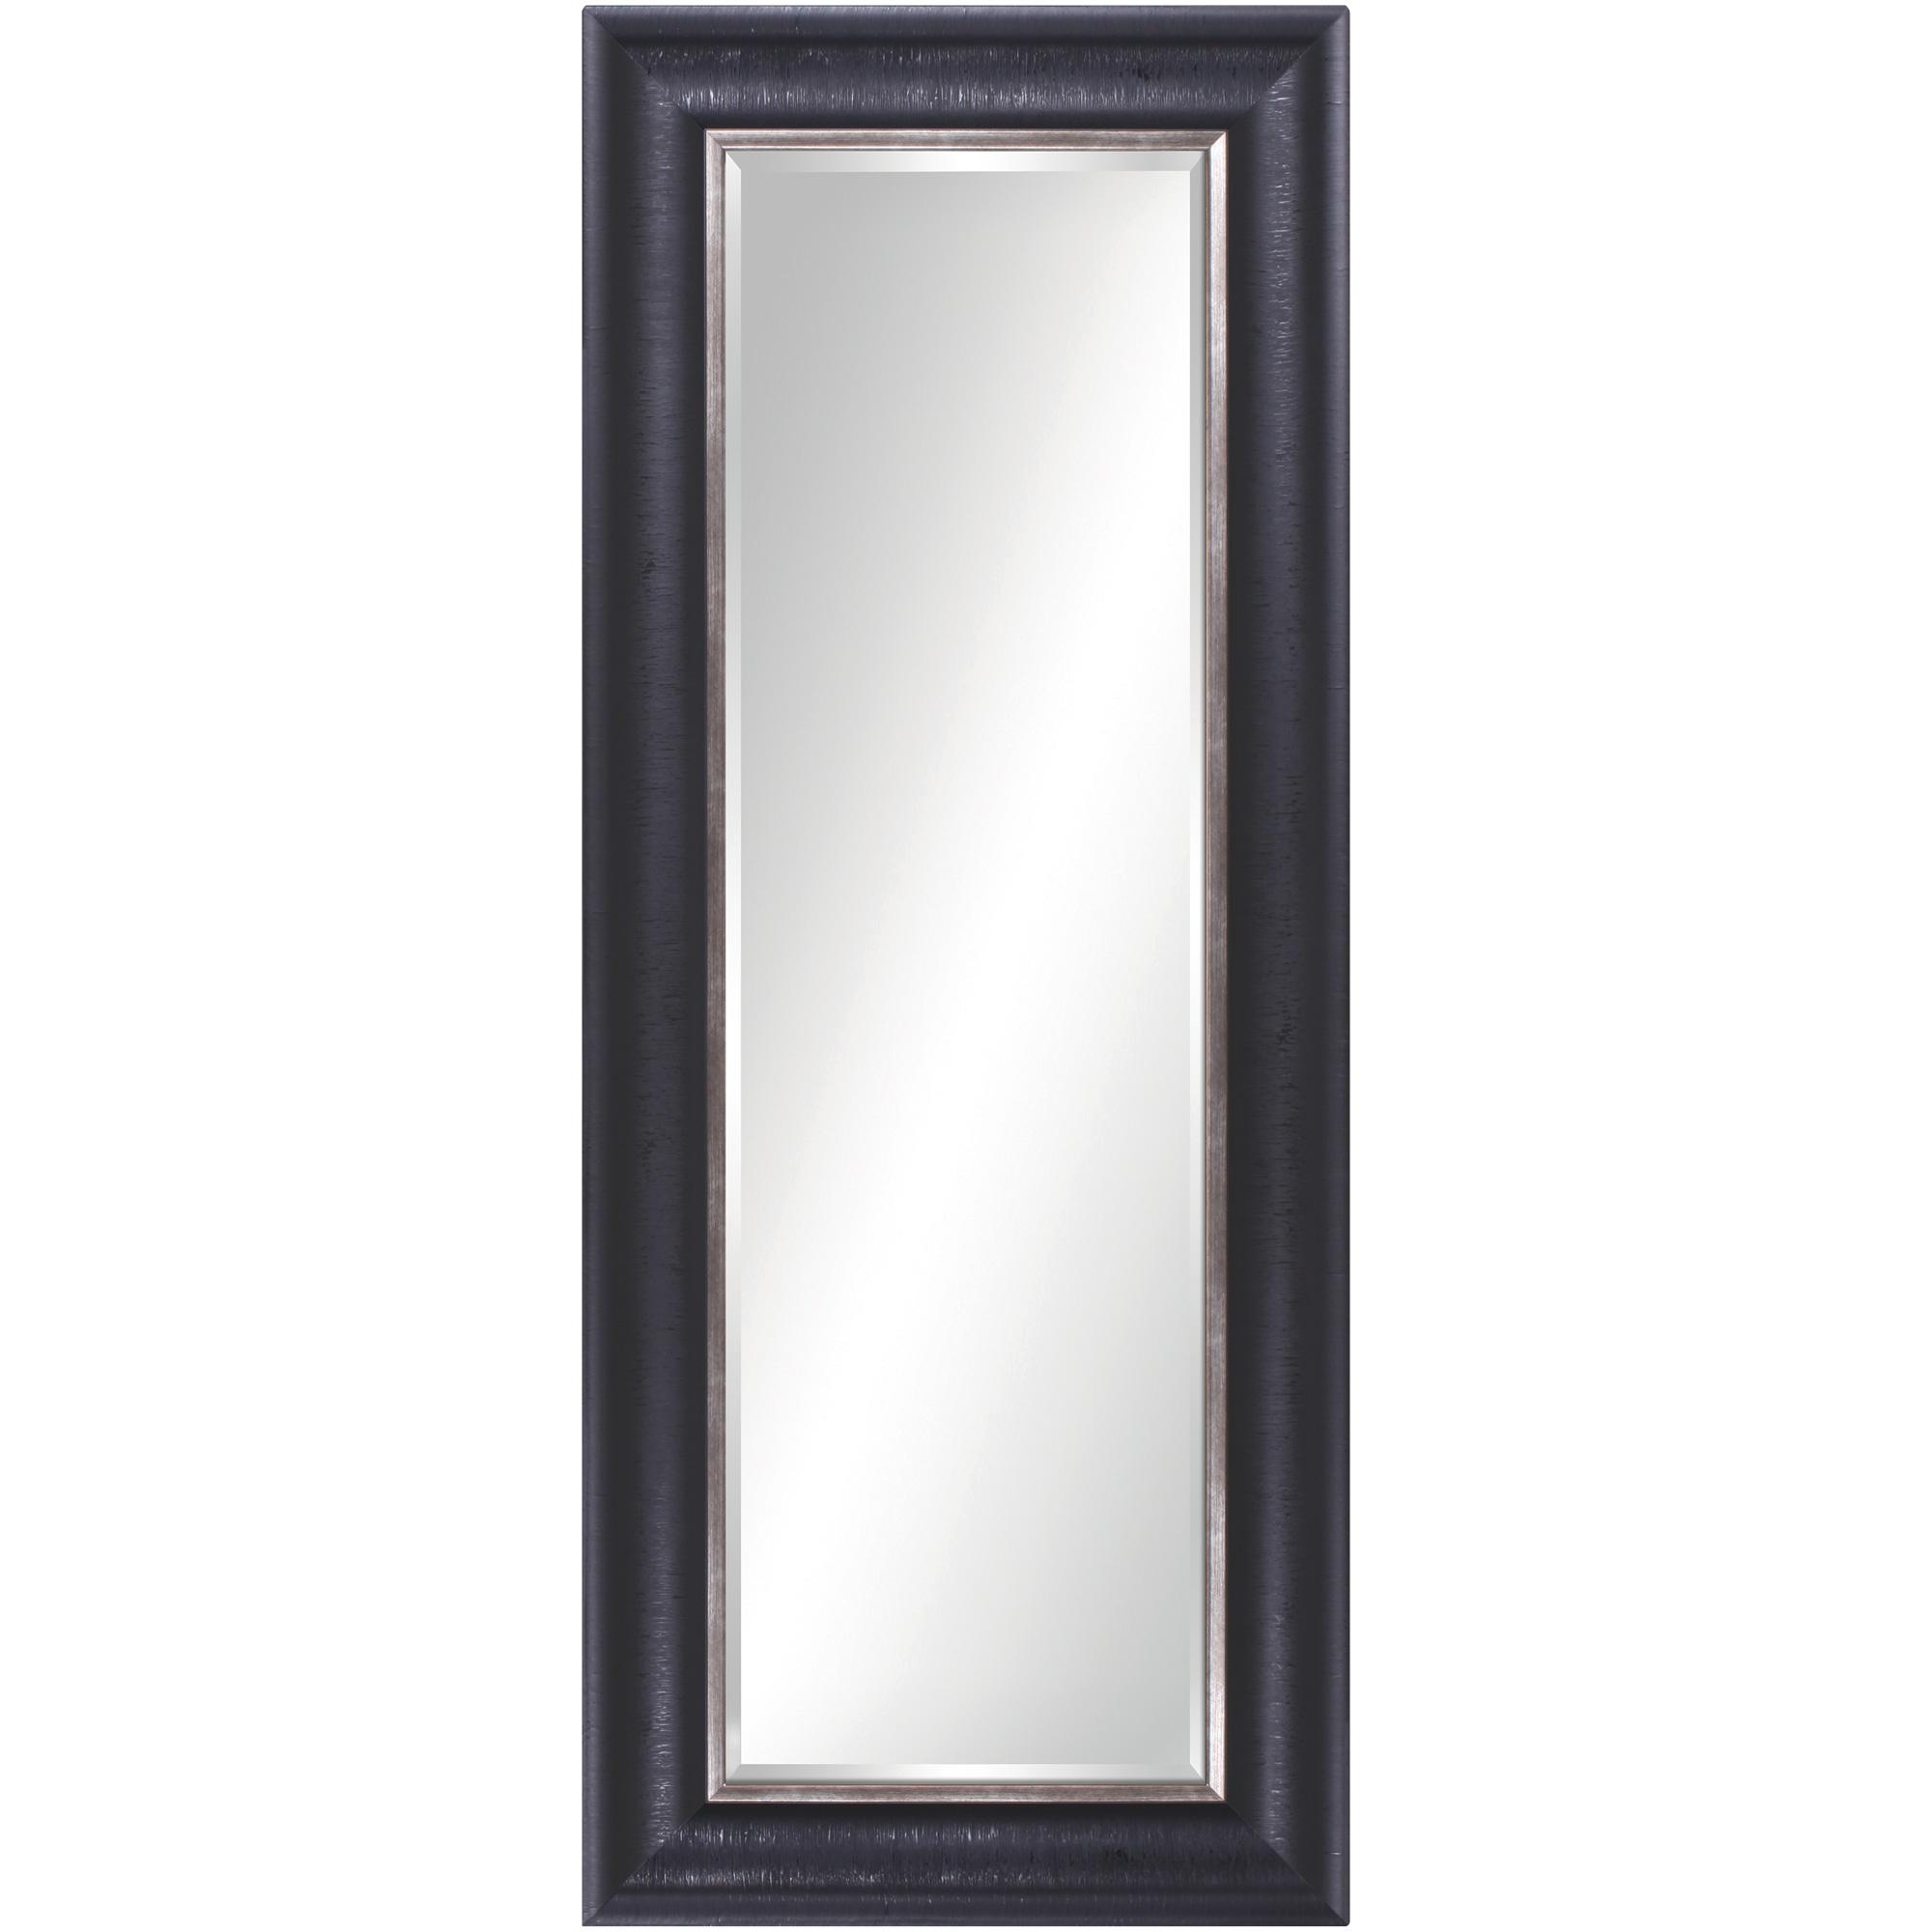 Art Effects | Black Rectangular Mirror